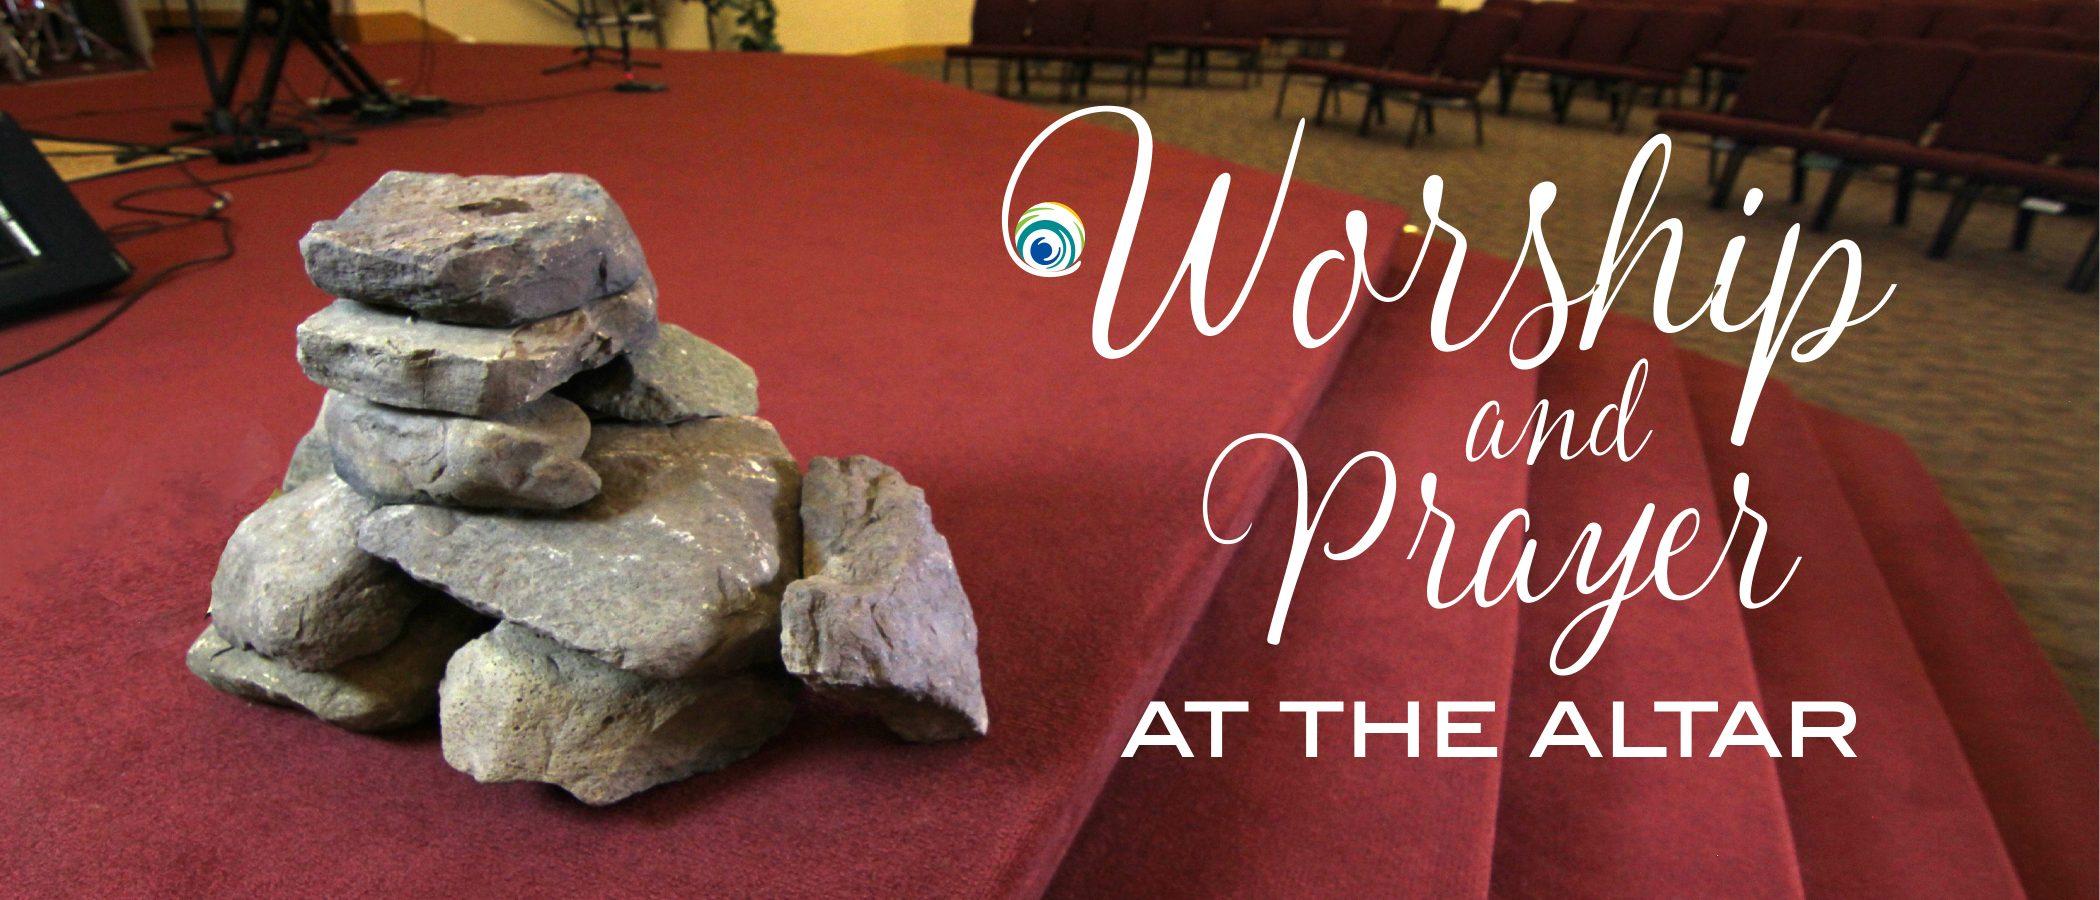 wednesday-morning-worship-and-prayer-11brd-dq2021-web-banner32x-100